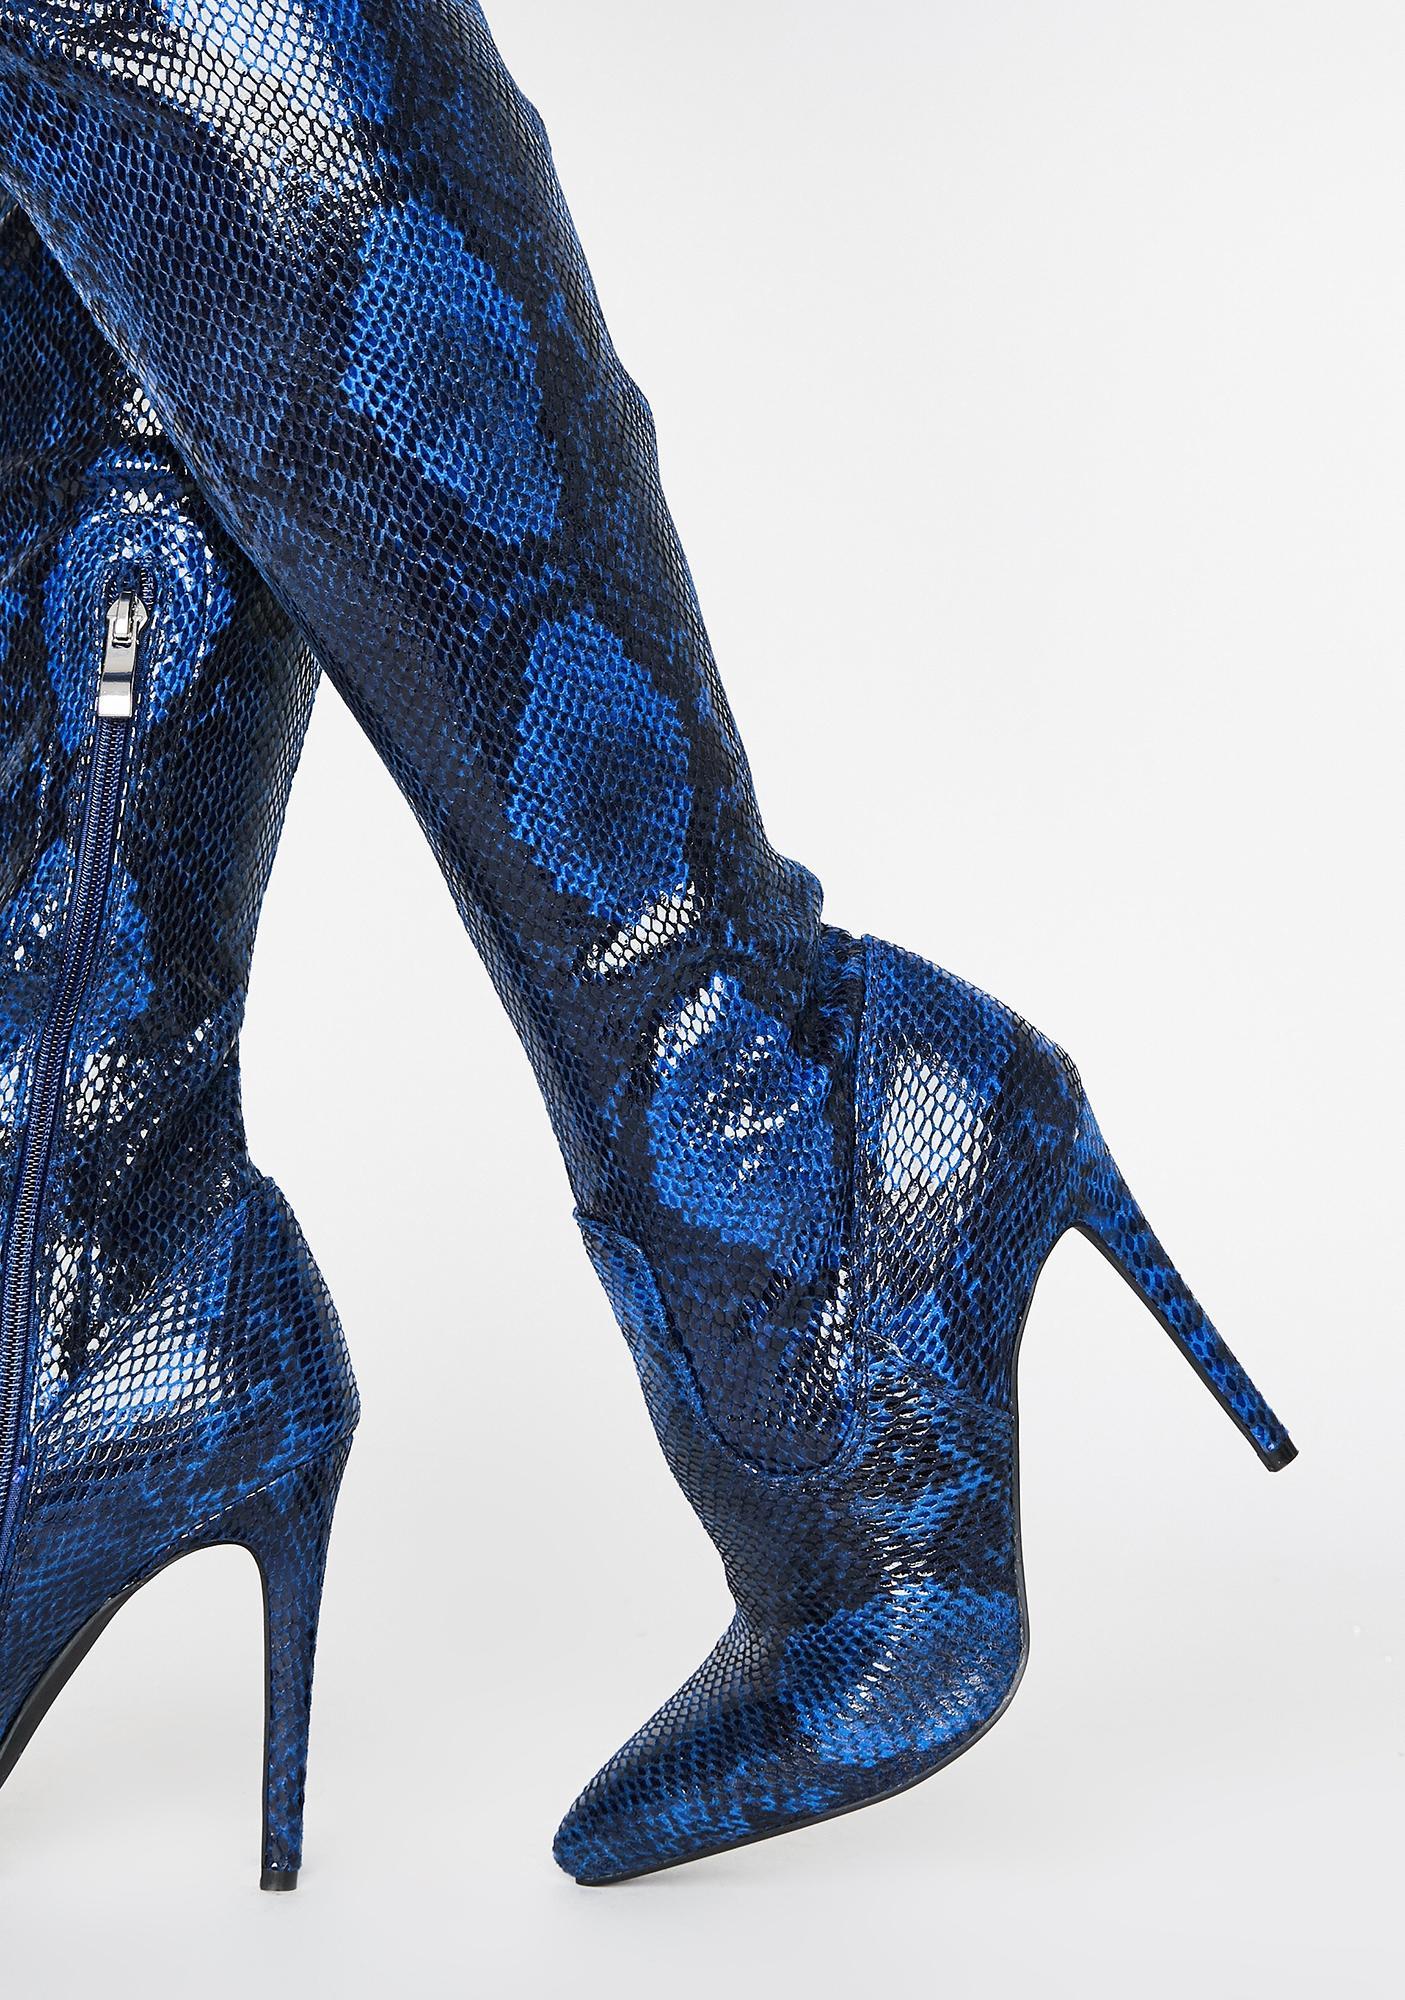 AZALEA WANG Dark Blue Westloop Snakeskin Chap Boots